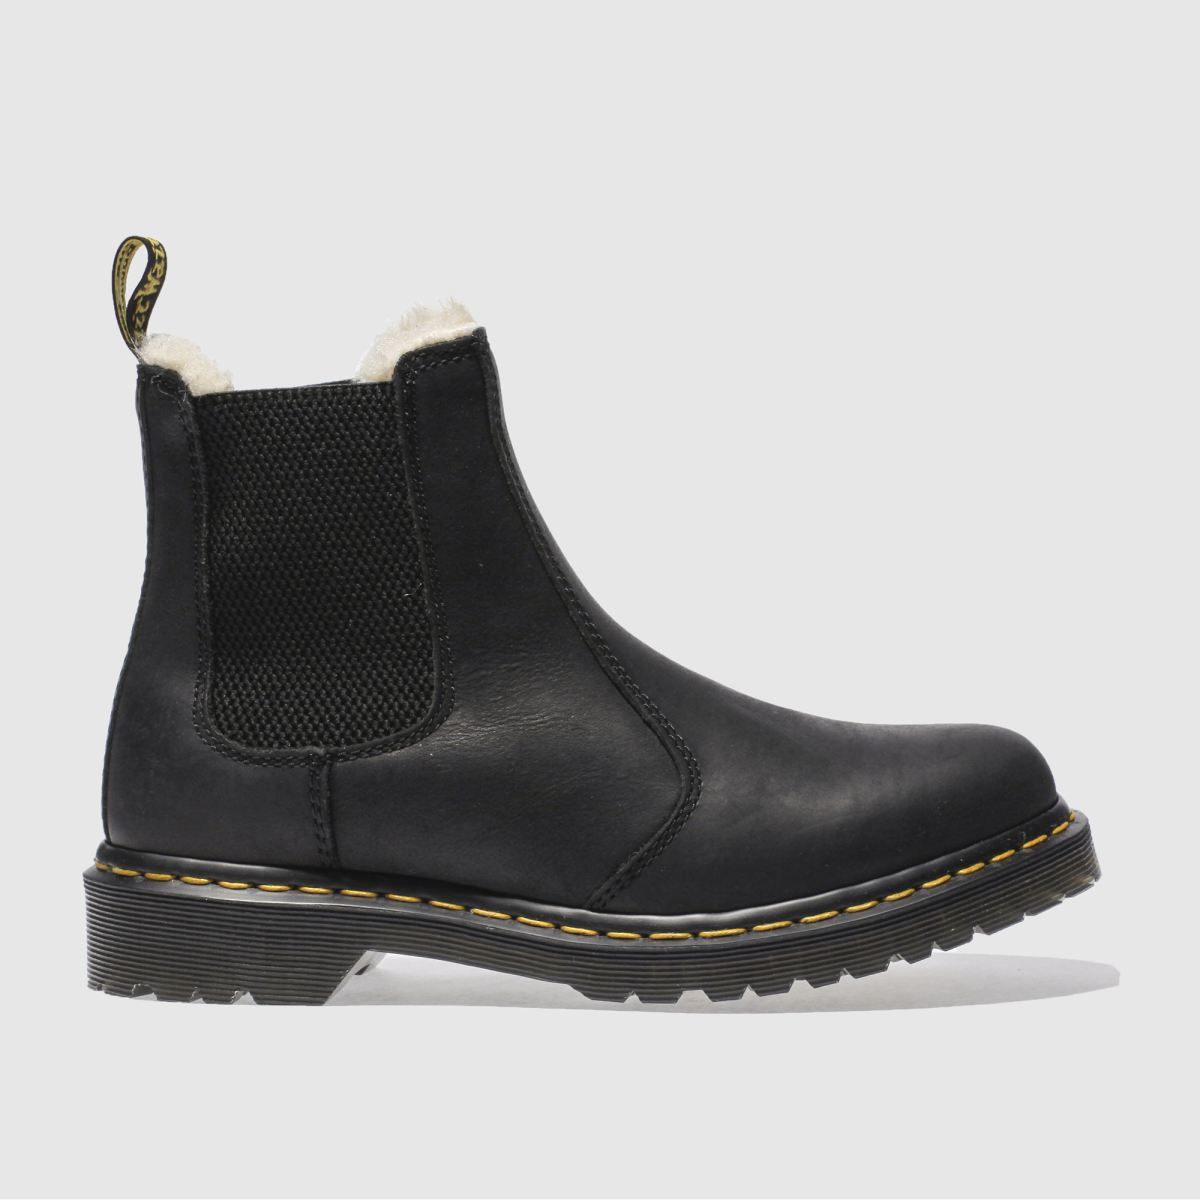 Dr Martens Black Leonore Fur Lined Chelsea Boots